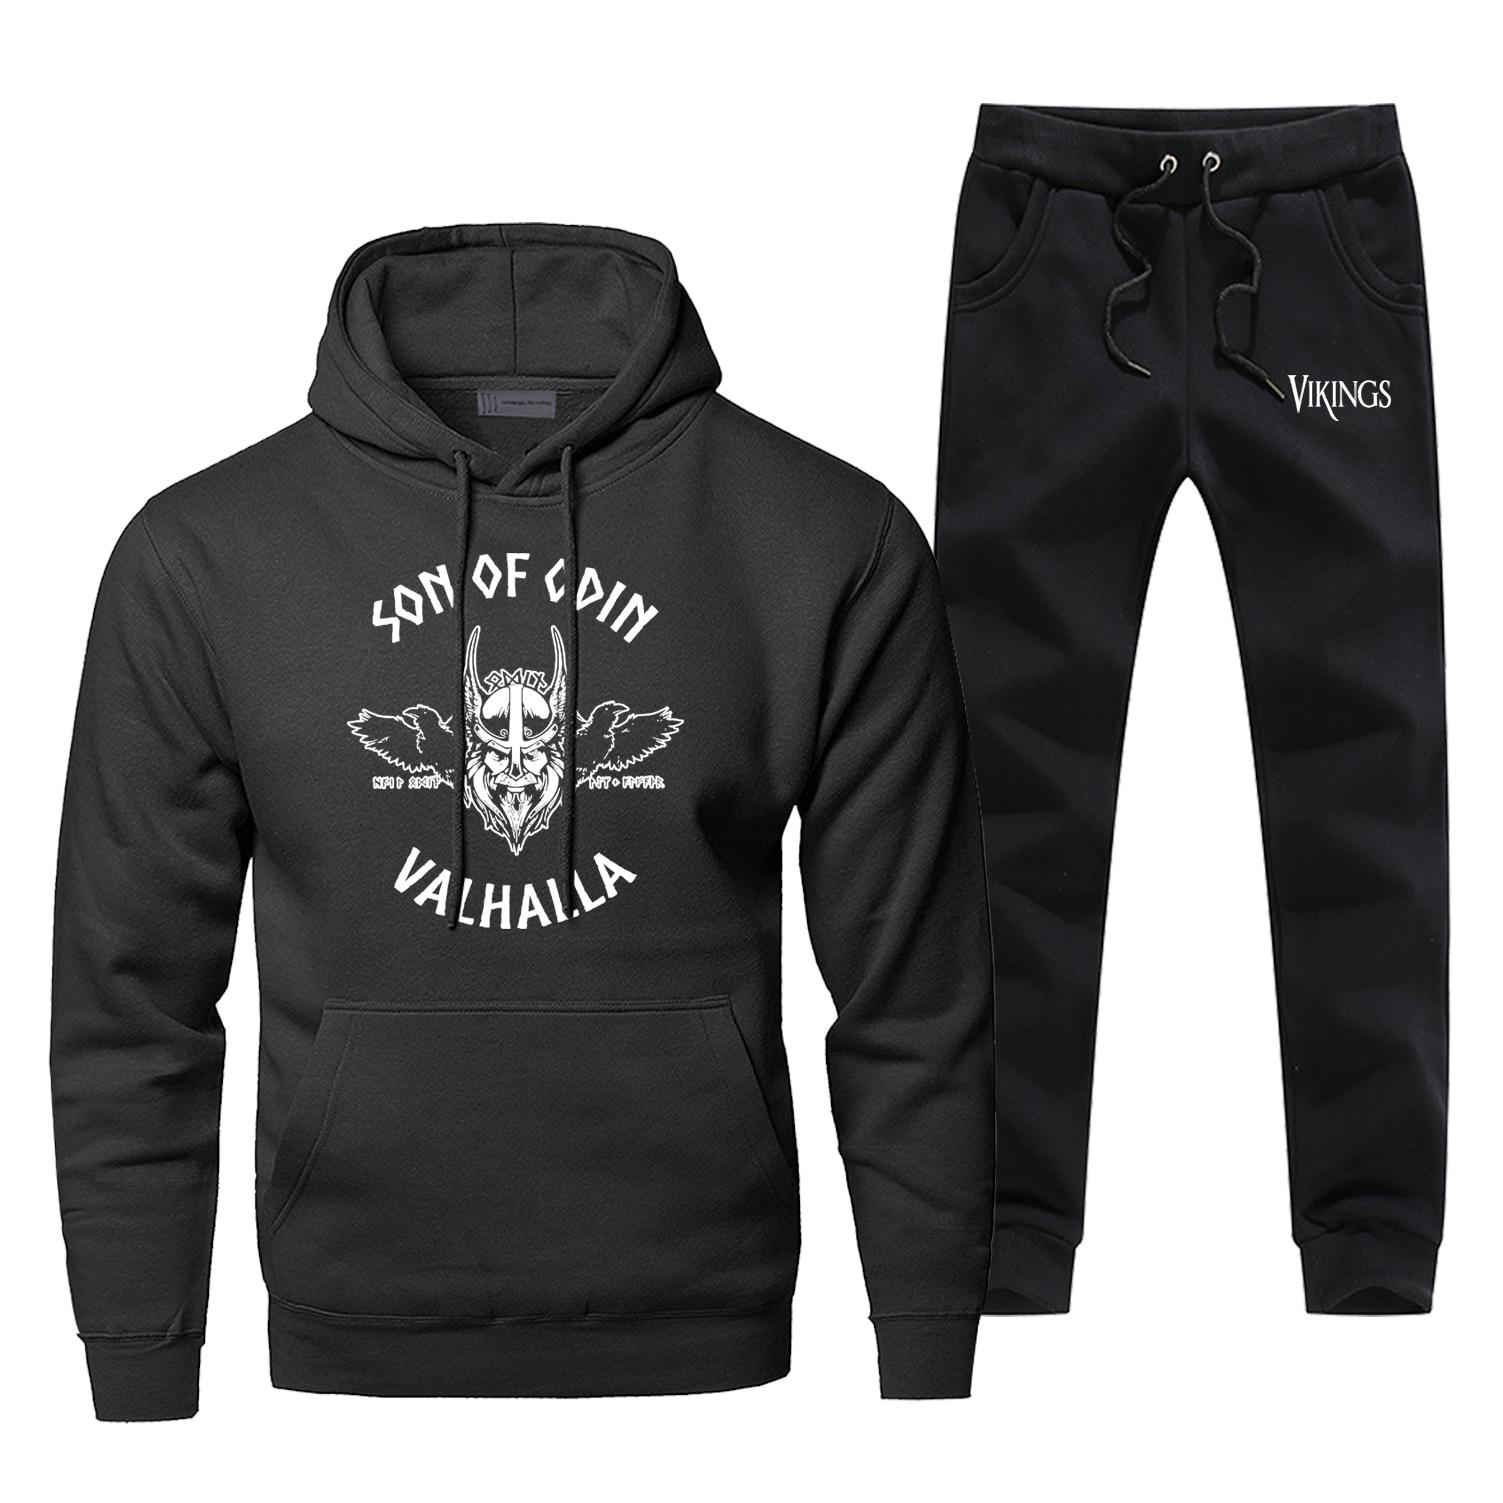 Tv Show Sons Of Odin Valhalla Viking Hoodies Pants Two Piece Sets Mens Fleece Casual Sweatshirt Harajuku Streetwear Sportswear